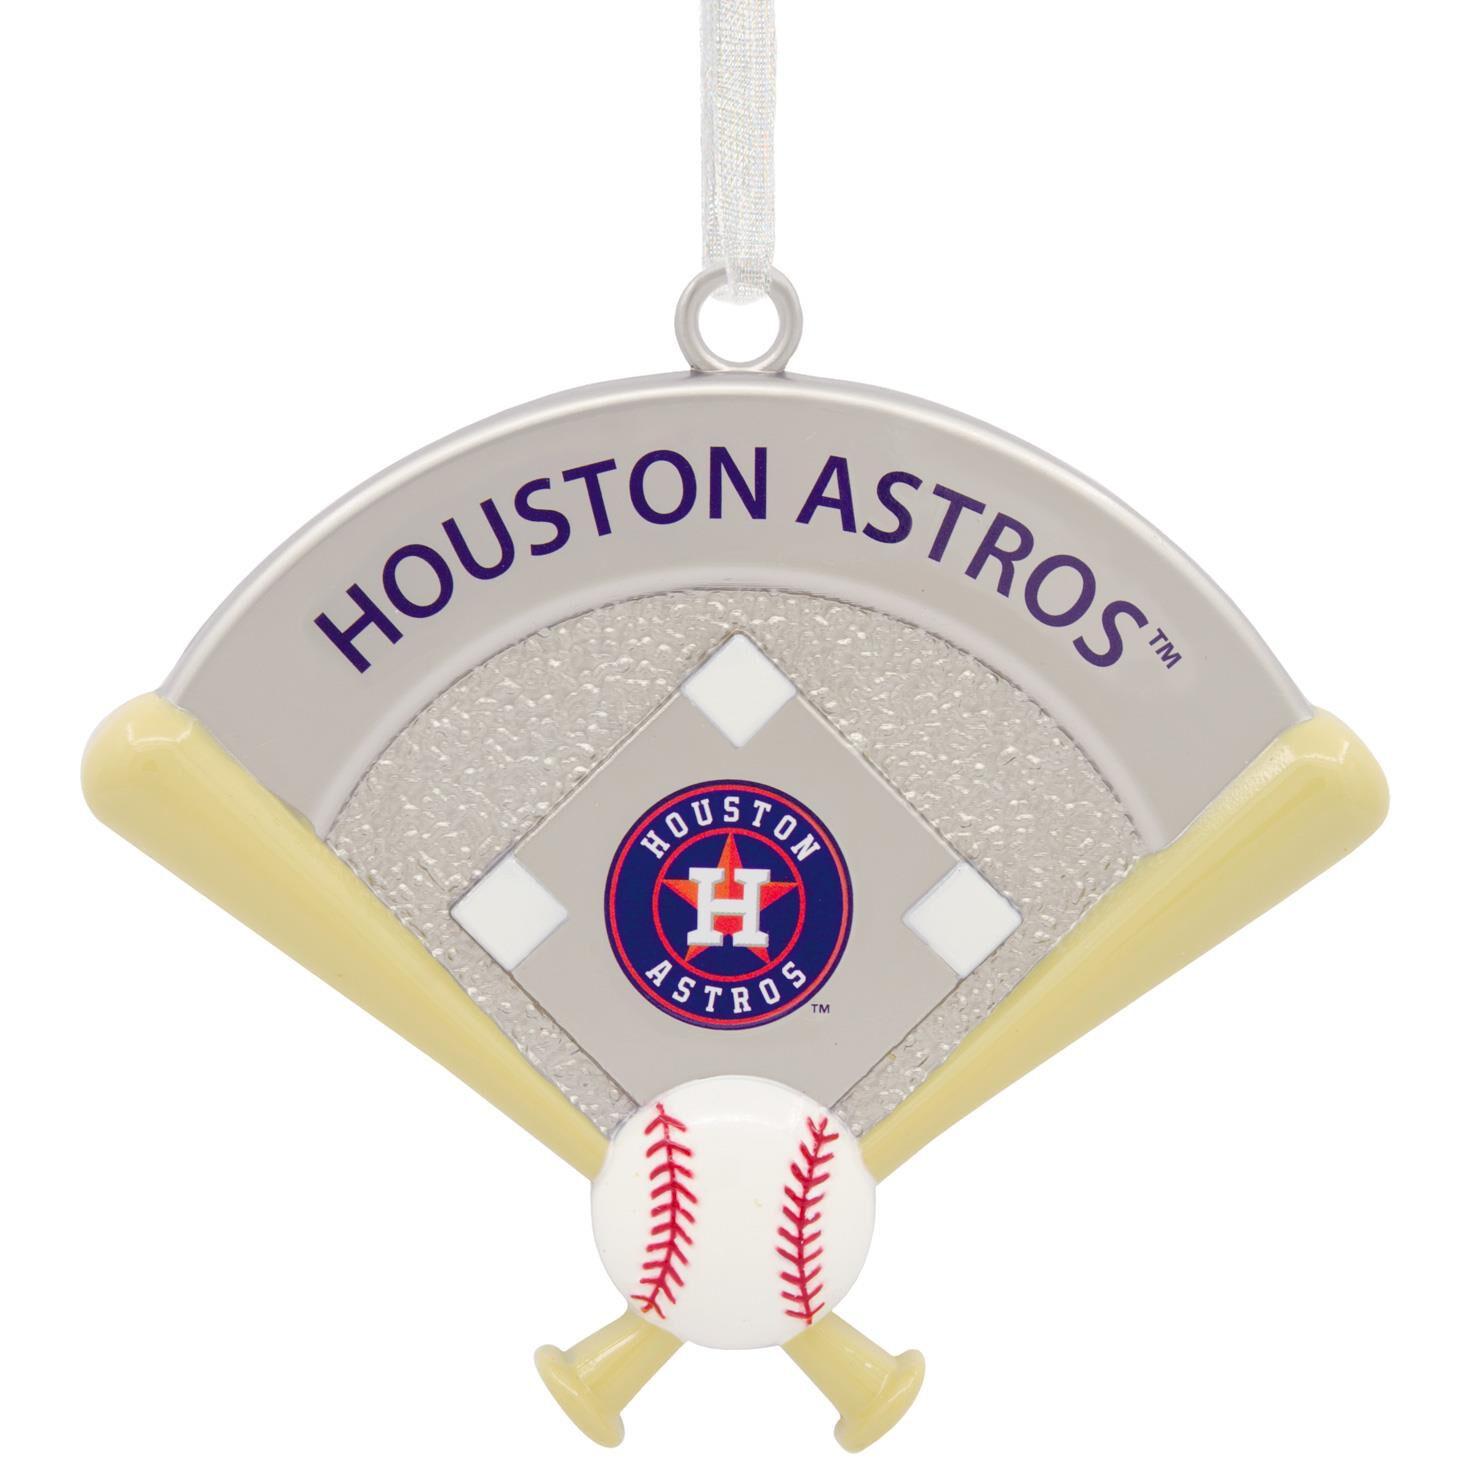 mlb houston astros metal hallmark ornament gift ornaments hallmark